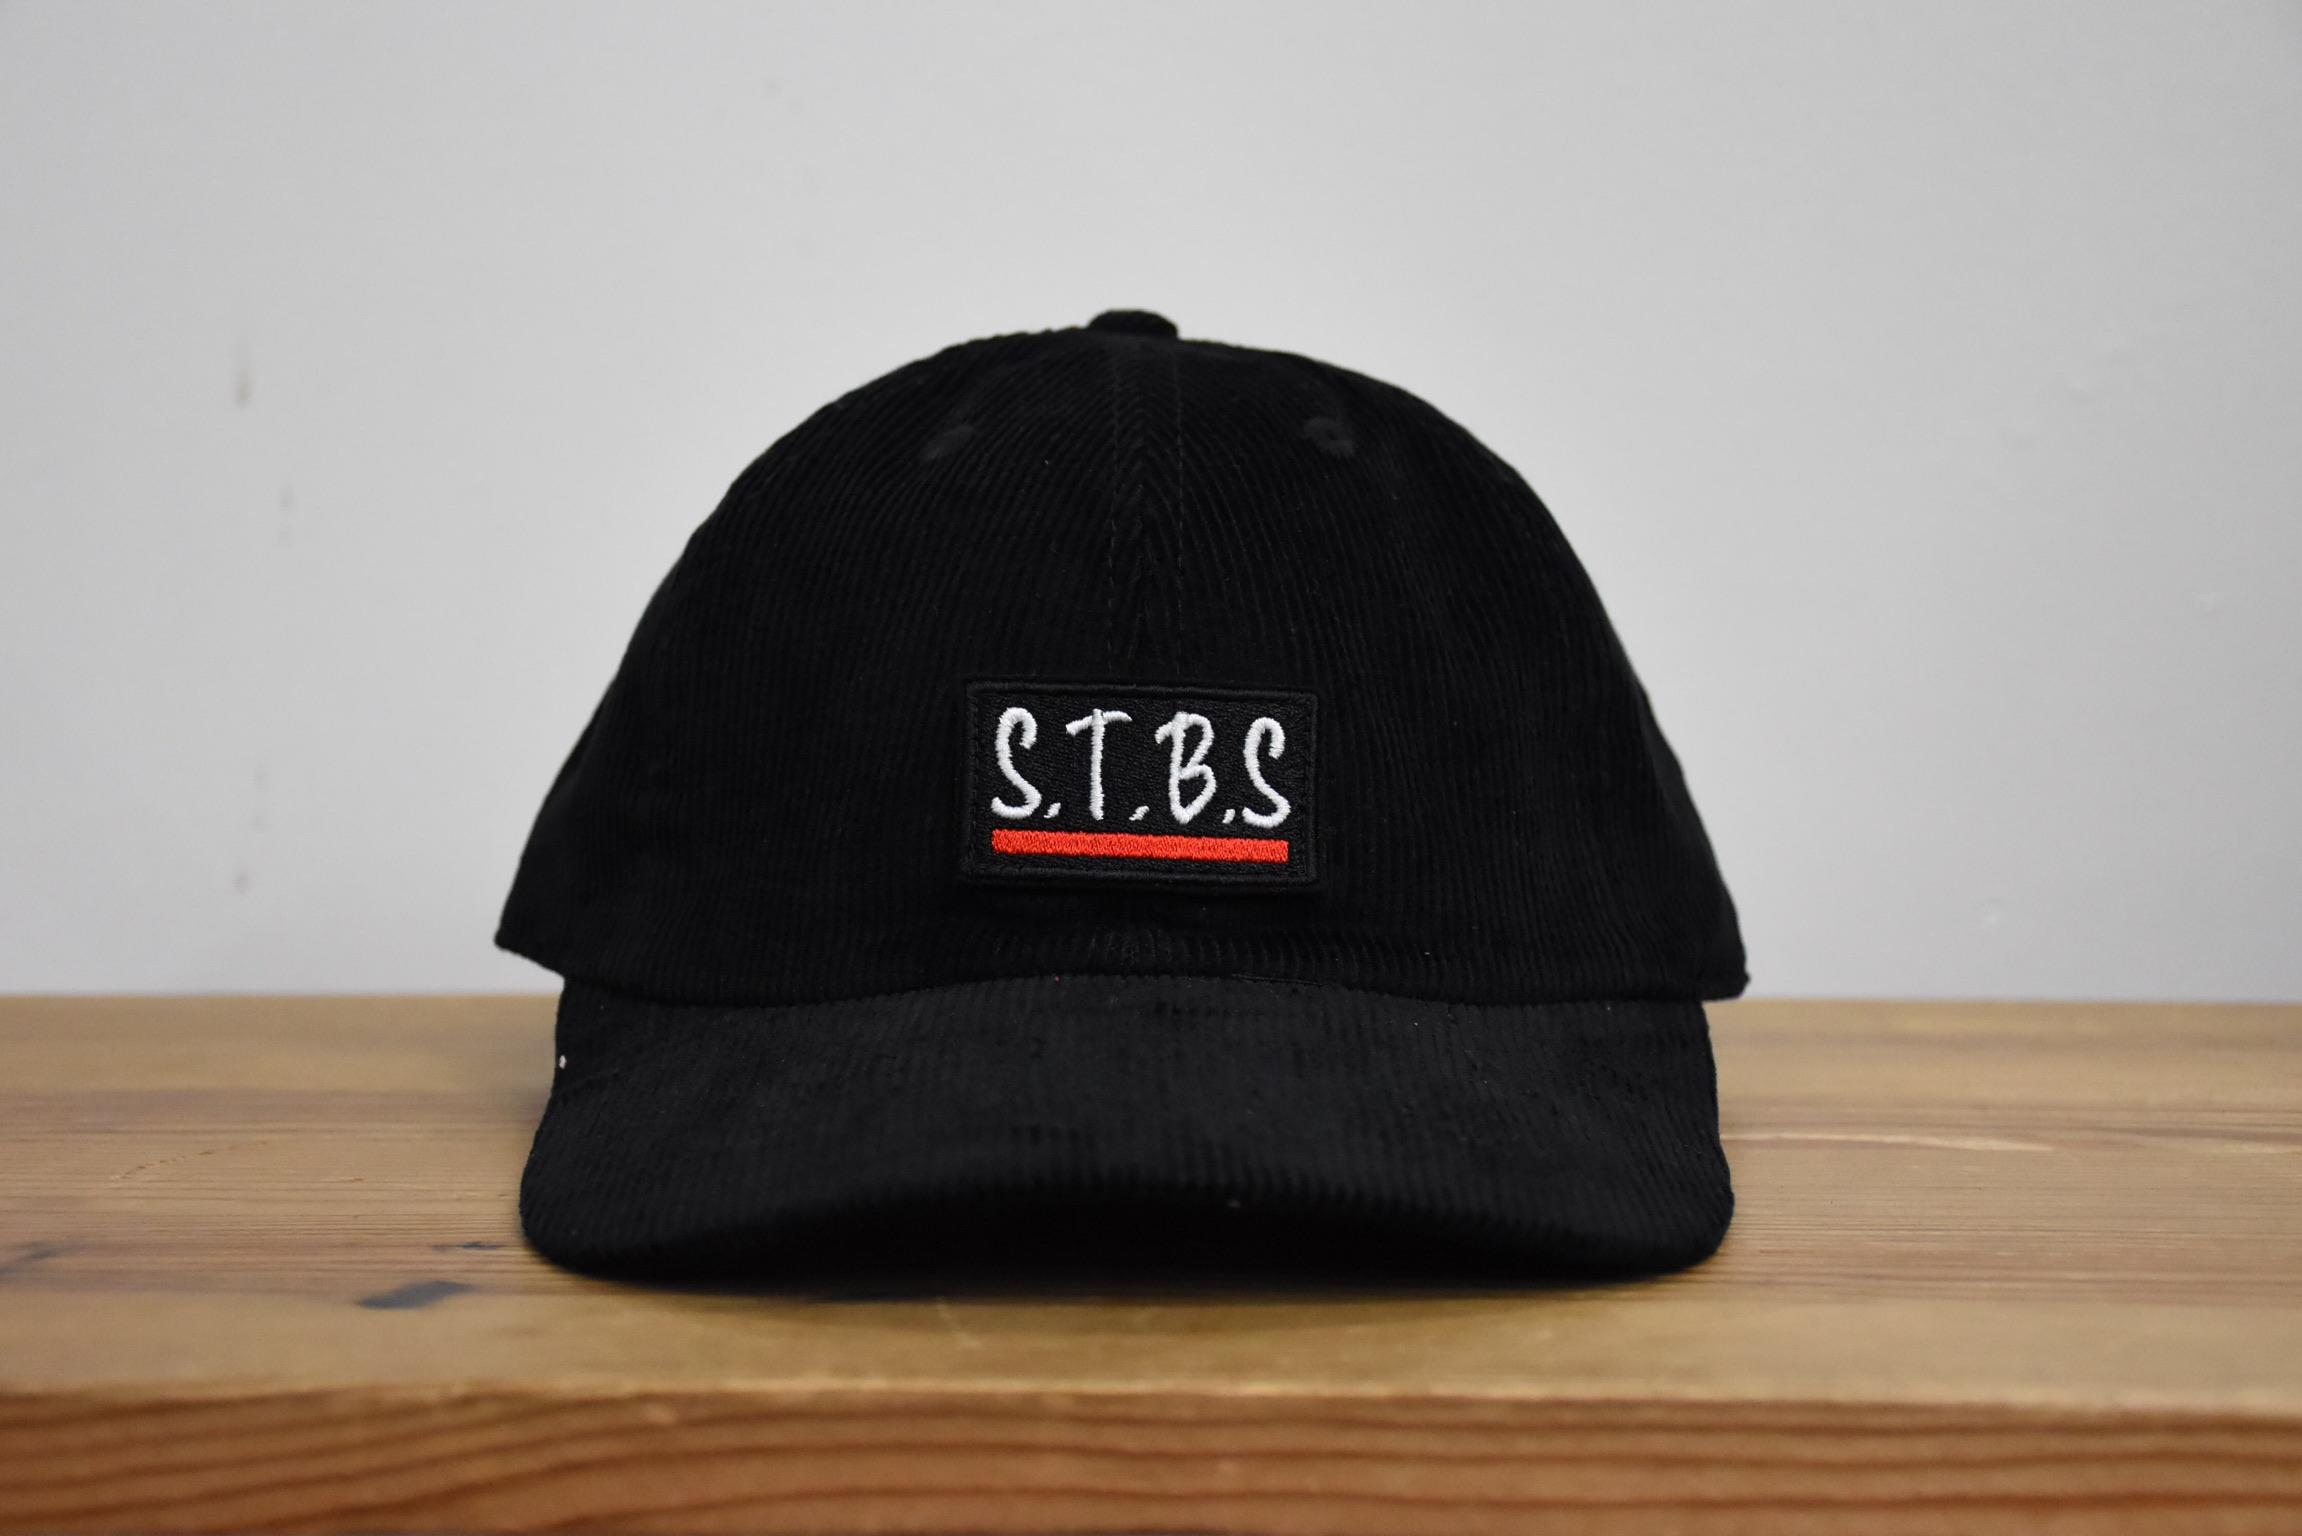 STARRBROS_CORDUROY_CAP_BLACK